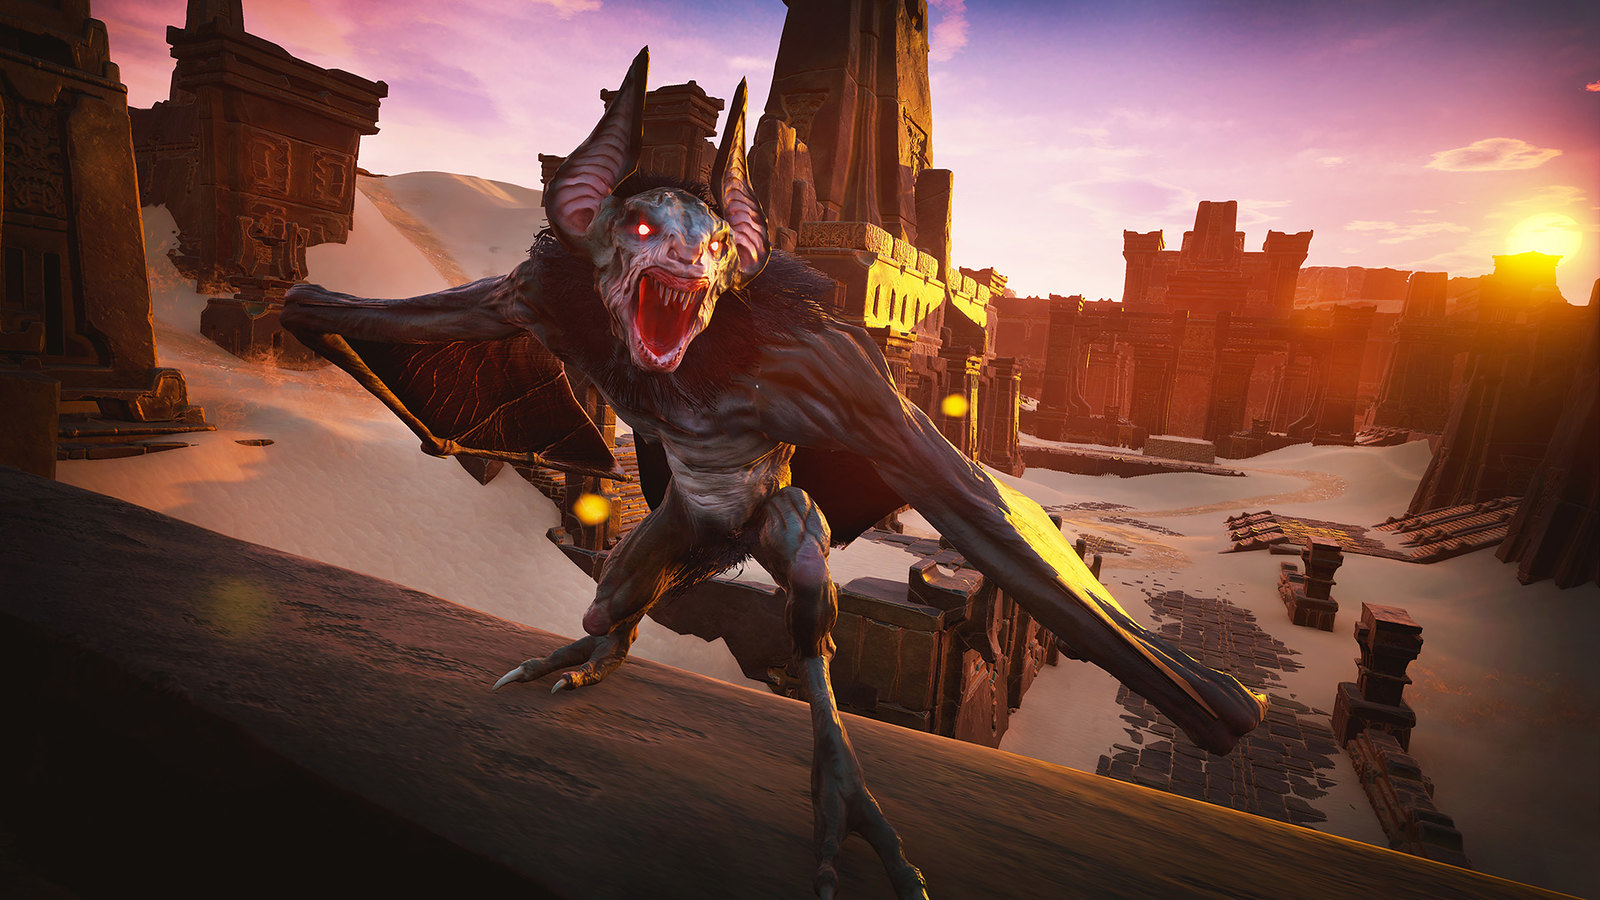 Bat Demon1_6k